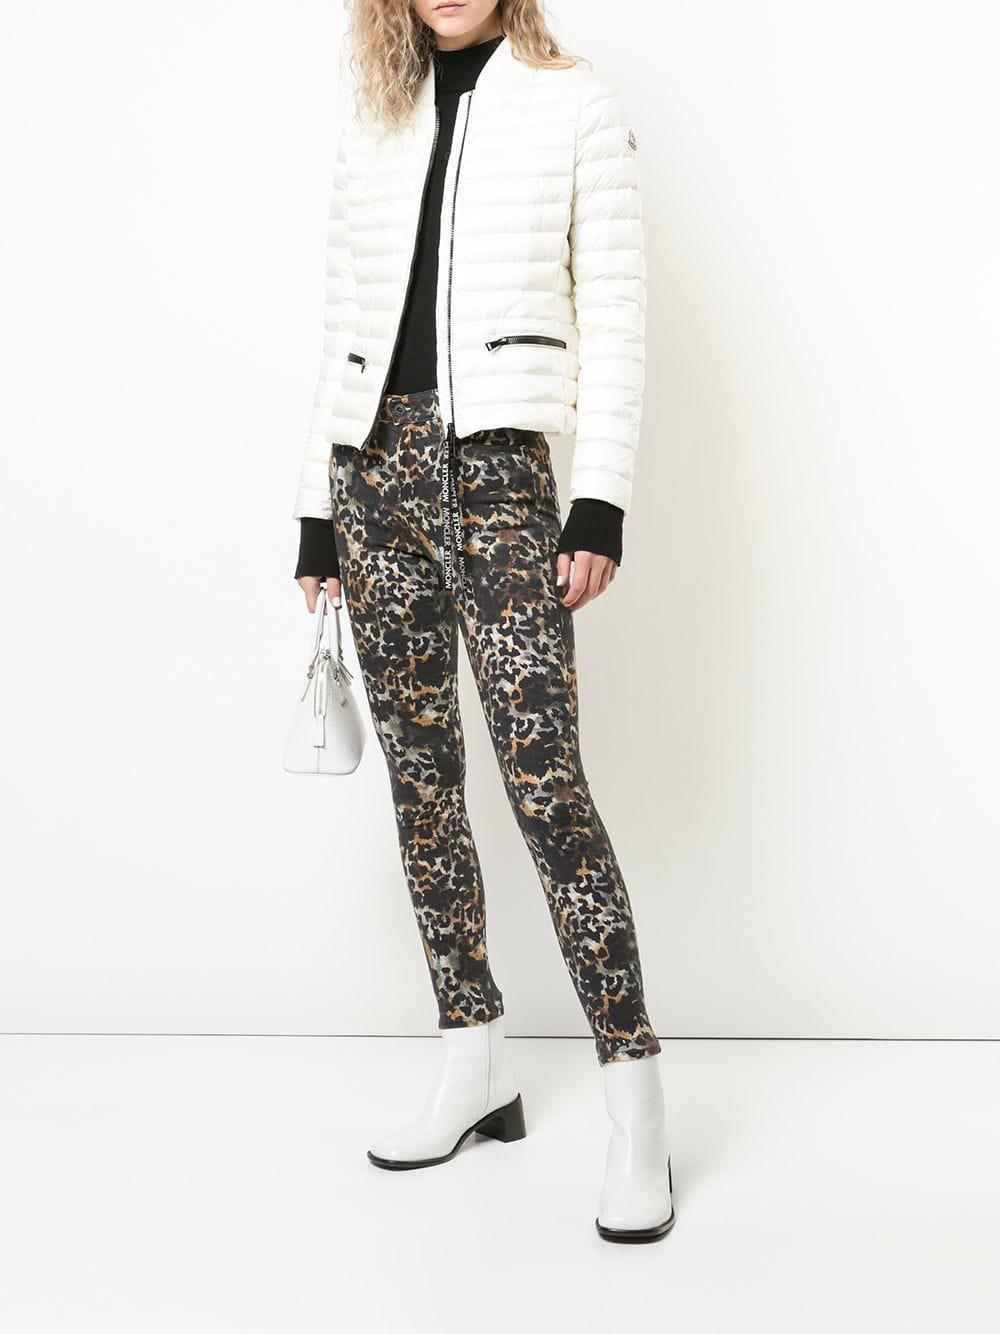 975c7311d071 AG Jeans Farrah Leopard Skinny Ankle Jeans in Black - Lyst